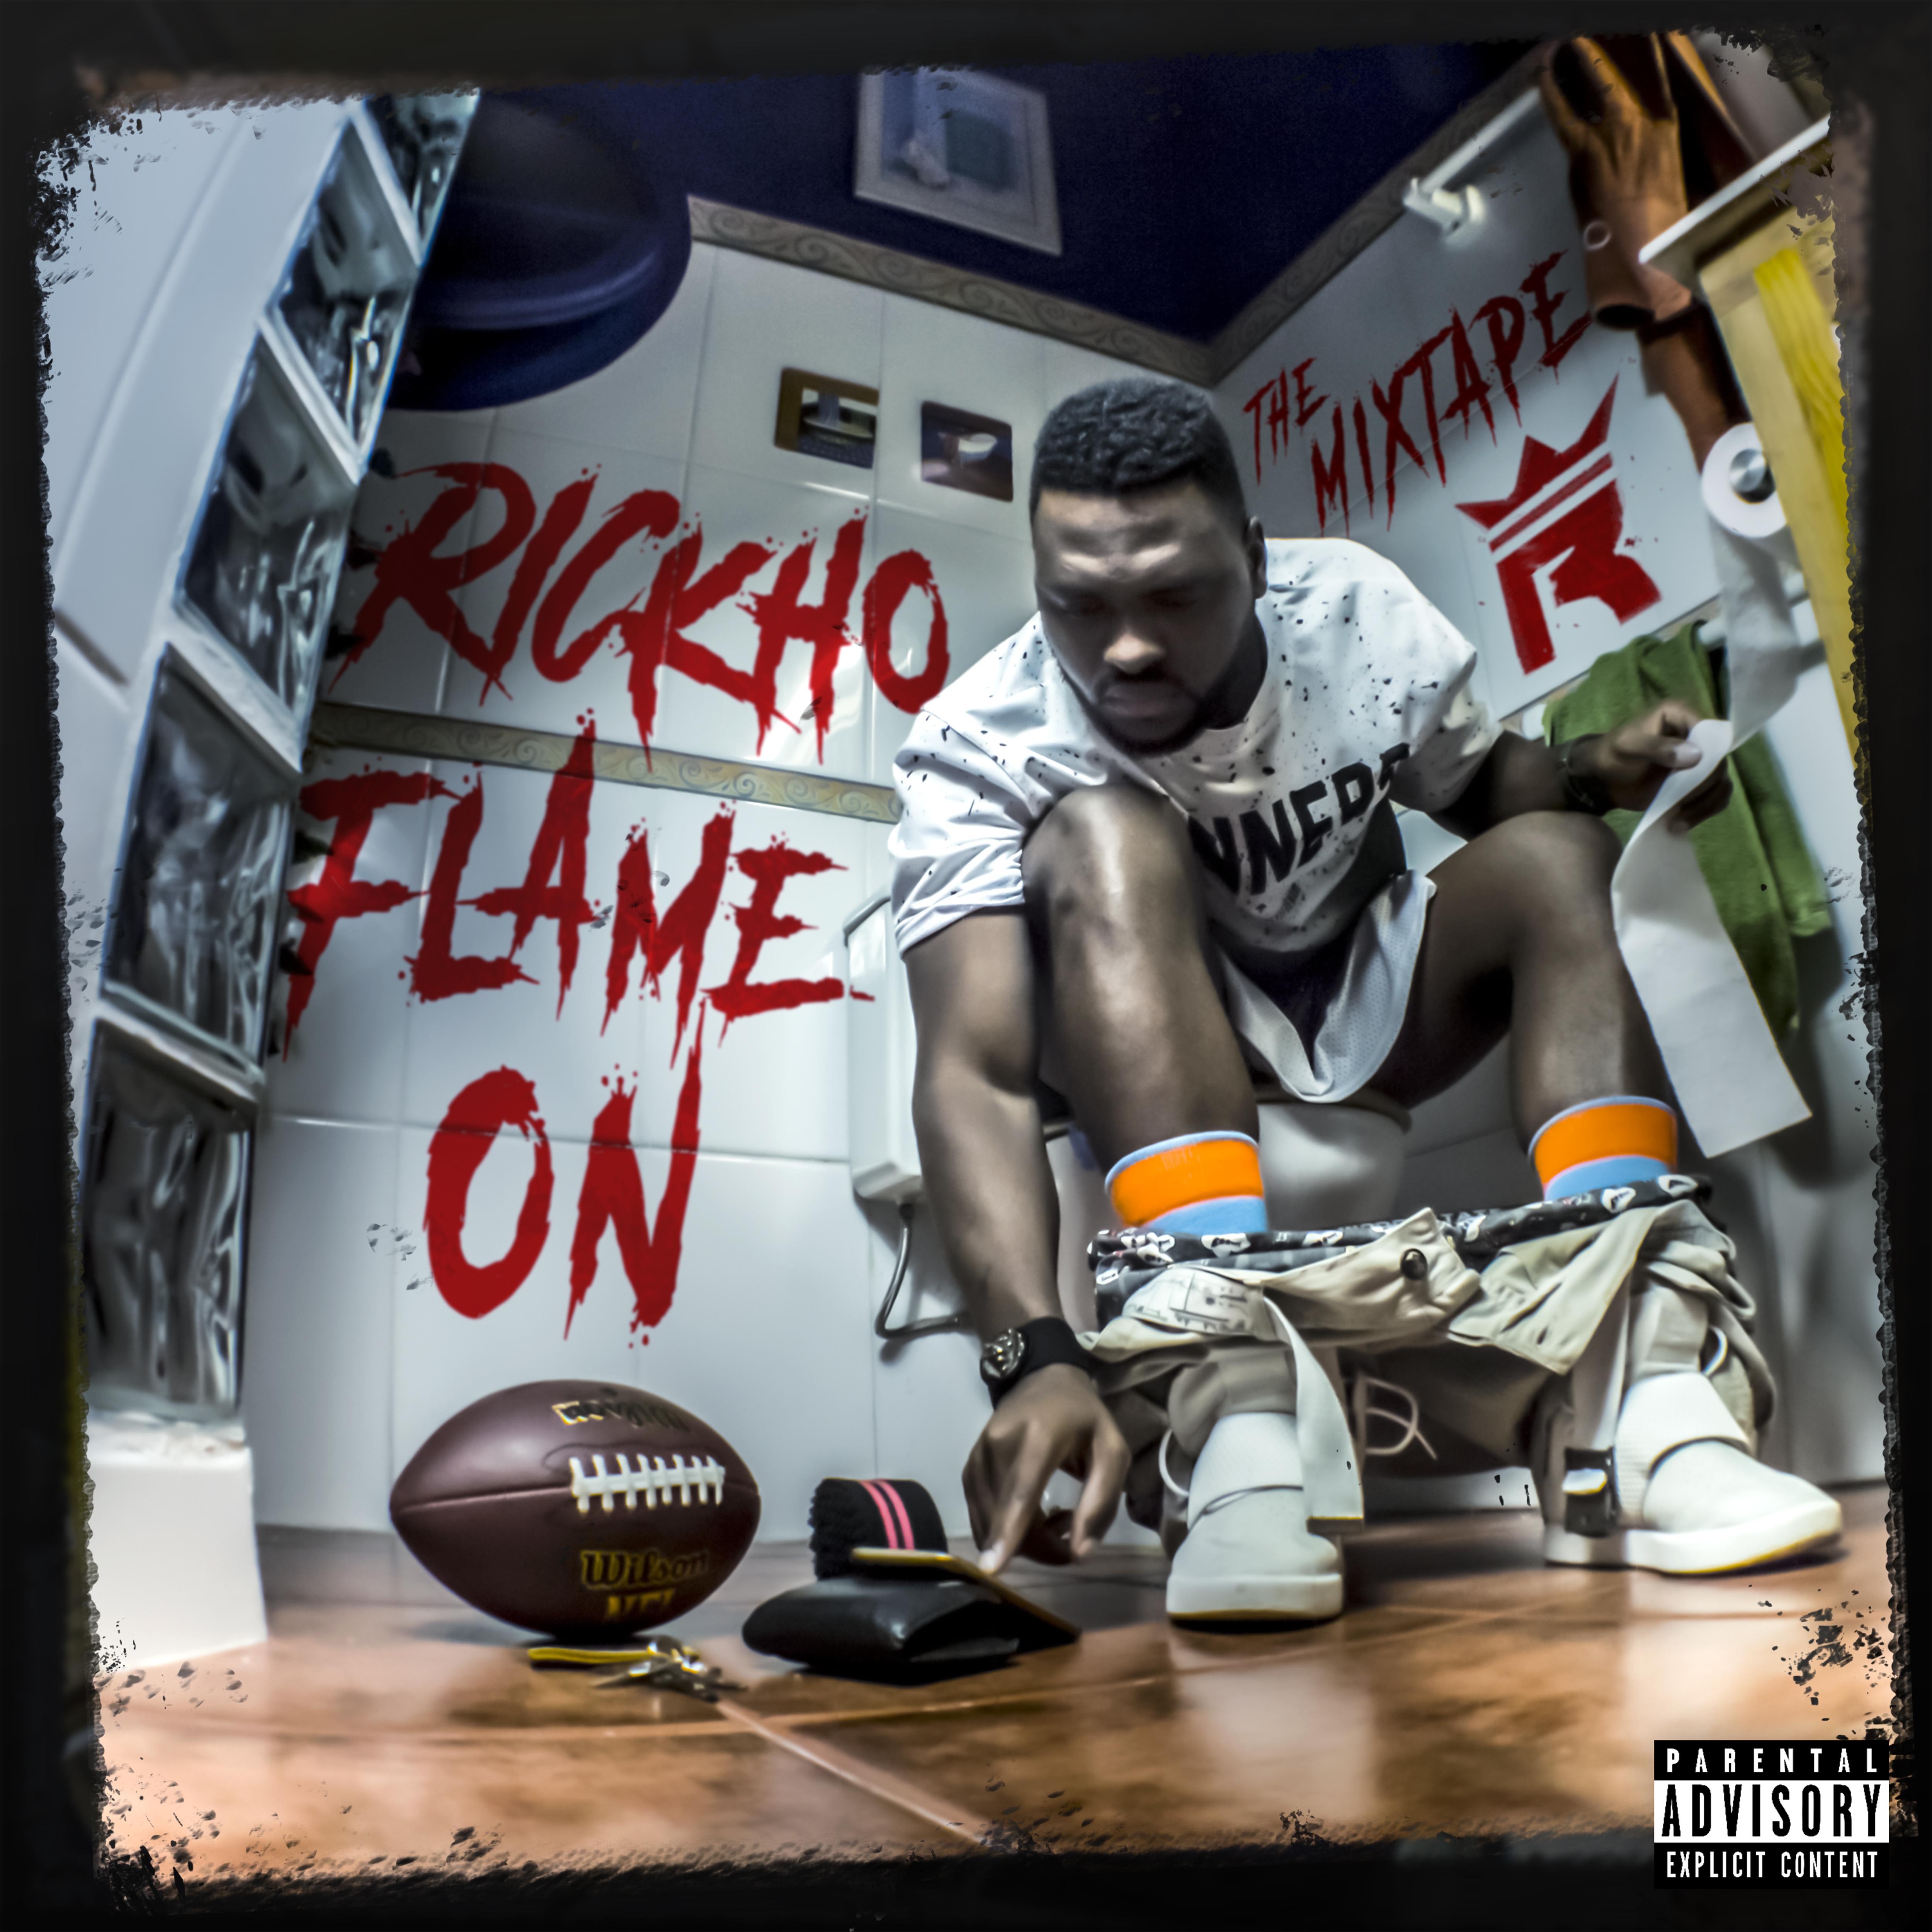 Rickho Flame On Ya Disponible